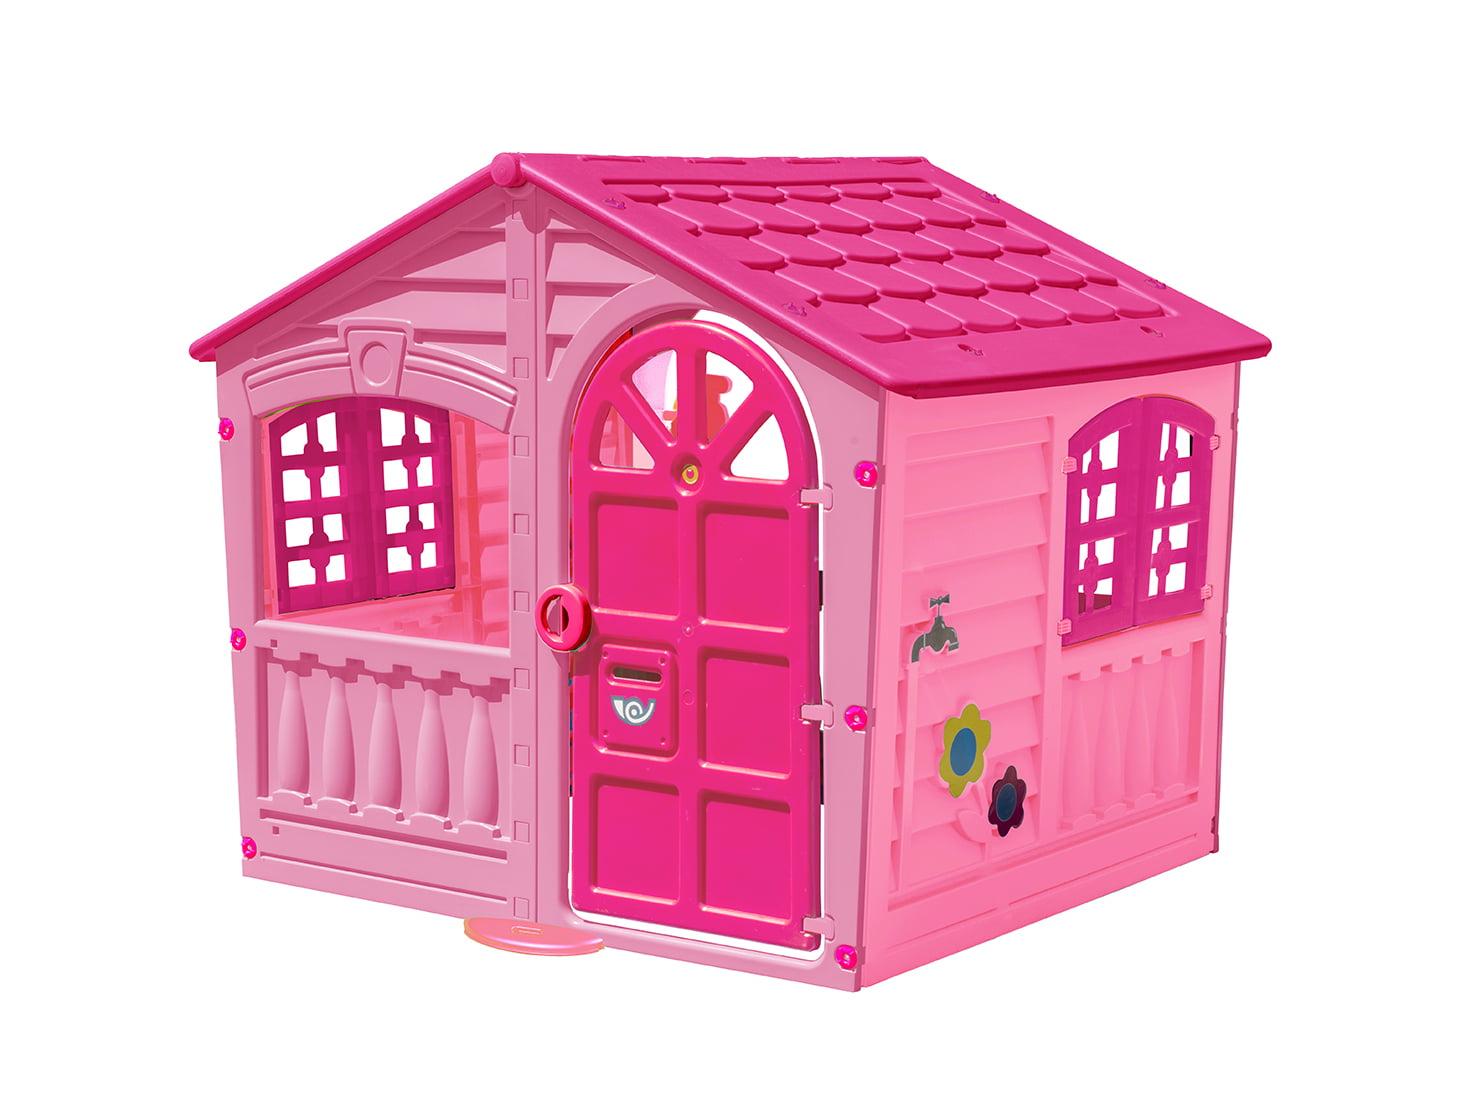 Pal Play Children\'s Fun House, Pink - Walmart.com